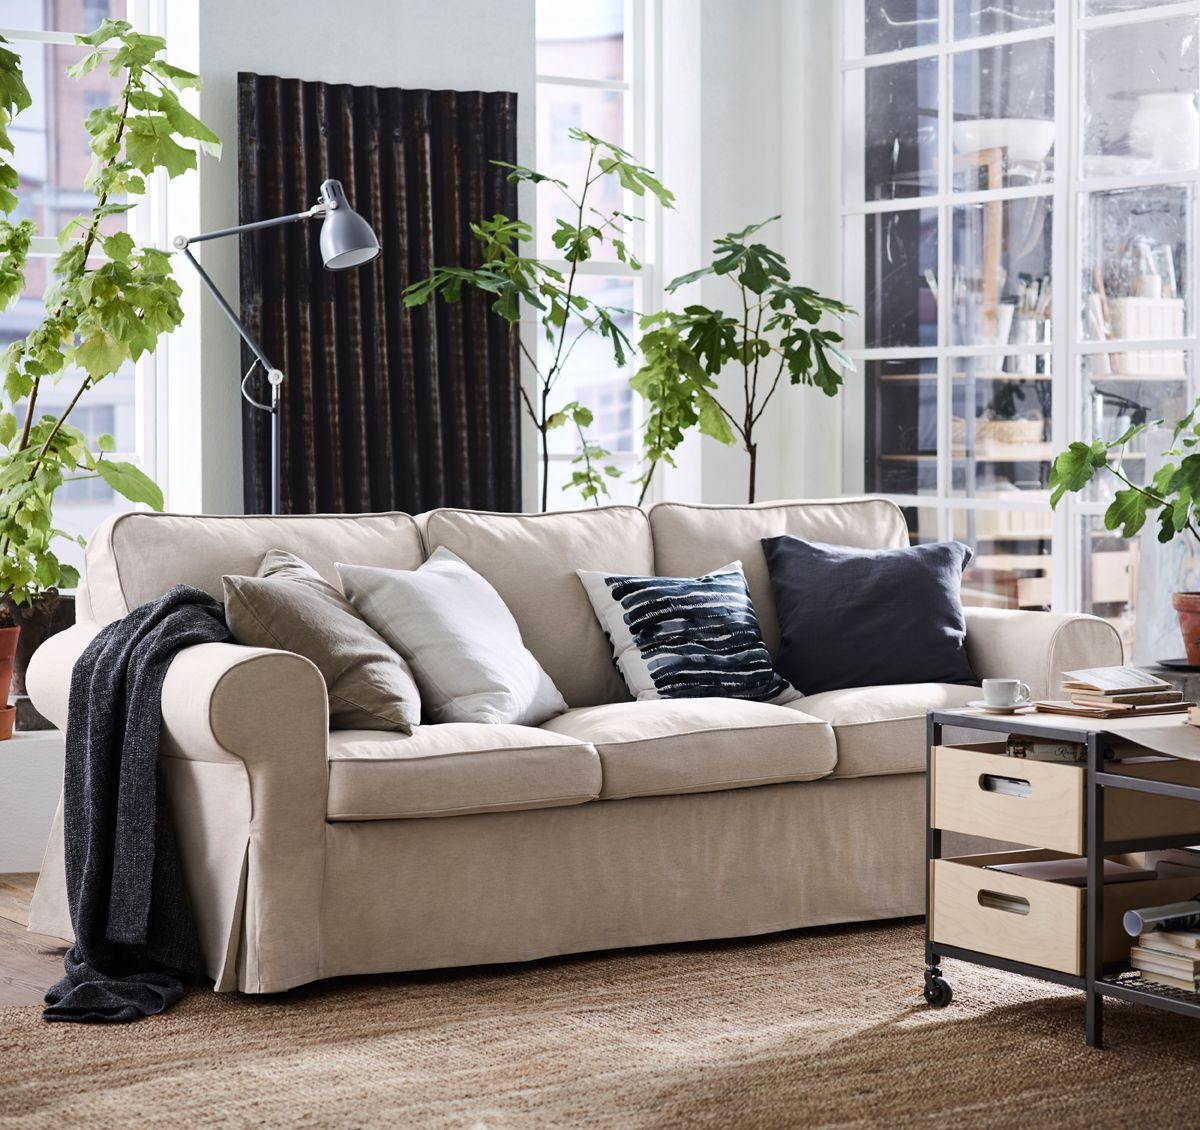 ektorp sofas in 2018 gef llt mir gut pinterest salons apartments and living rooms. Black Bedroom Furniture Sets. Home Design Ideas